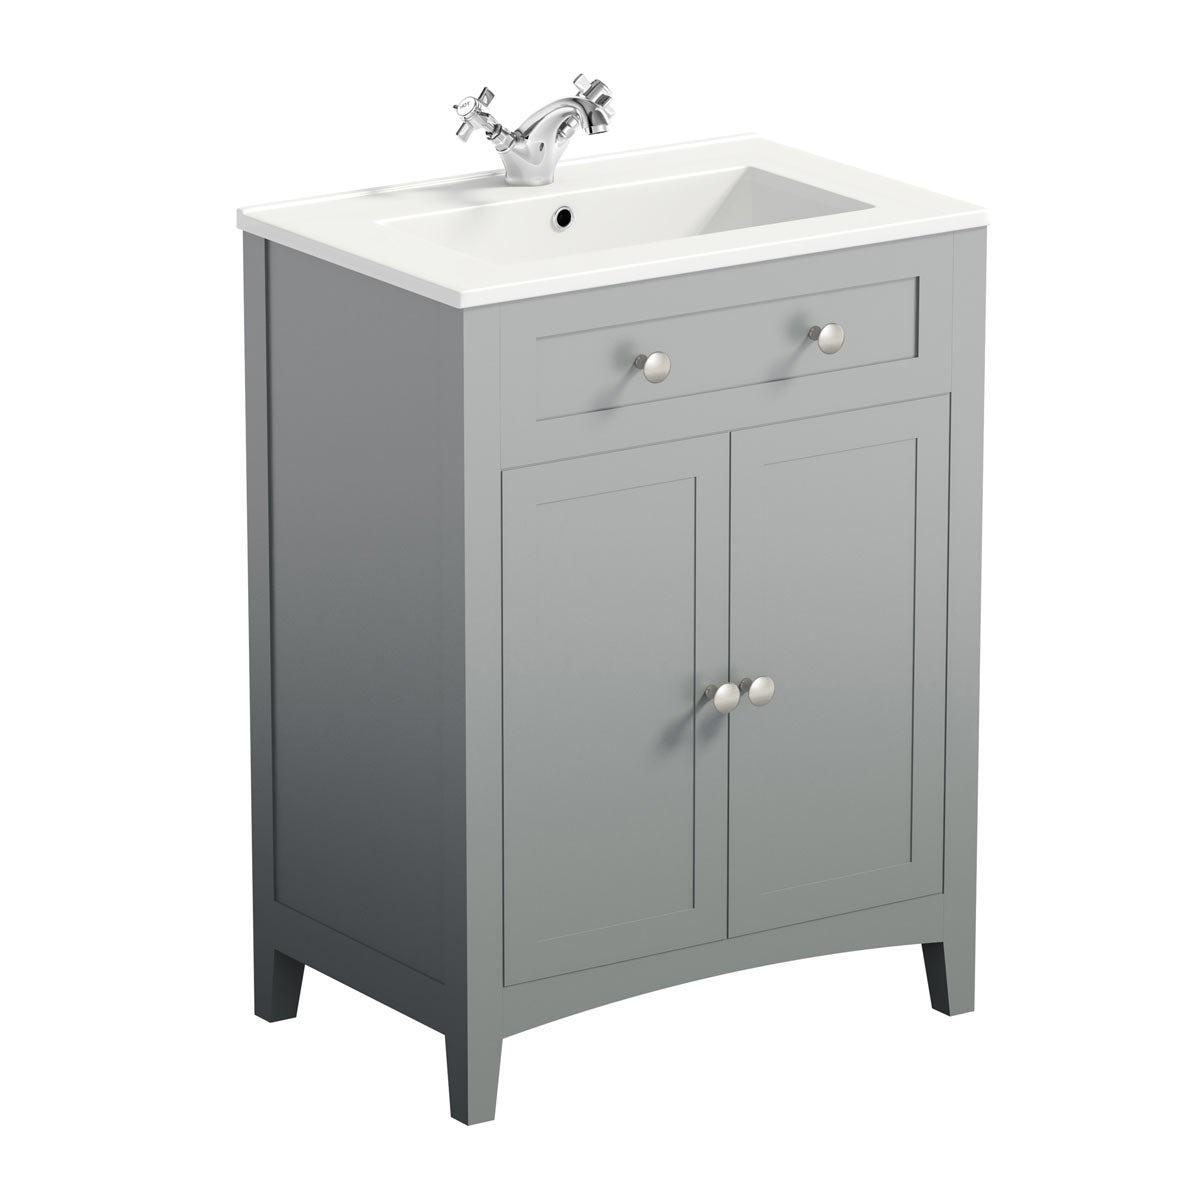 The Bath Co Camberley grey vanity unit with basin 600